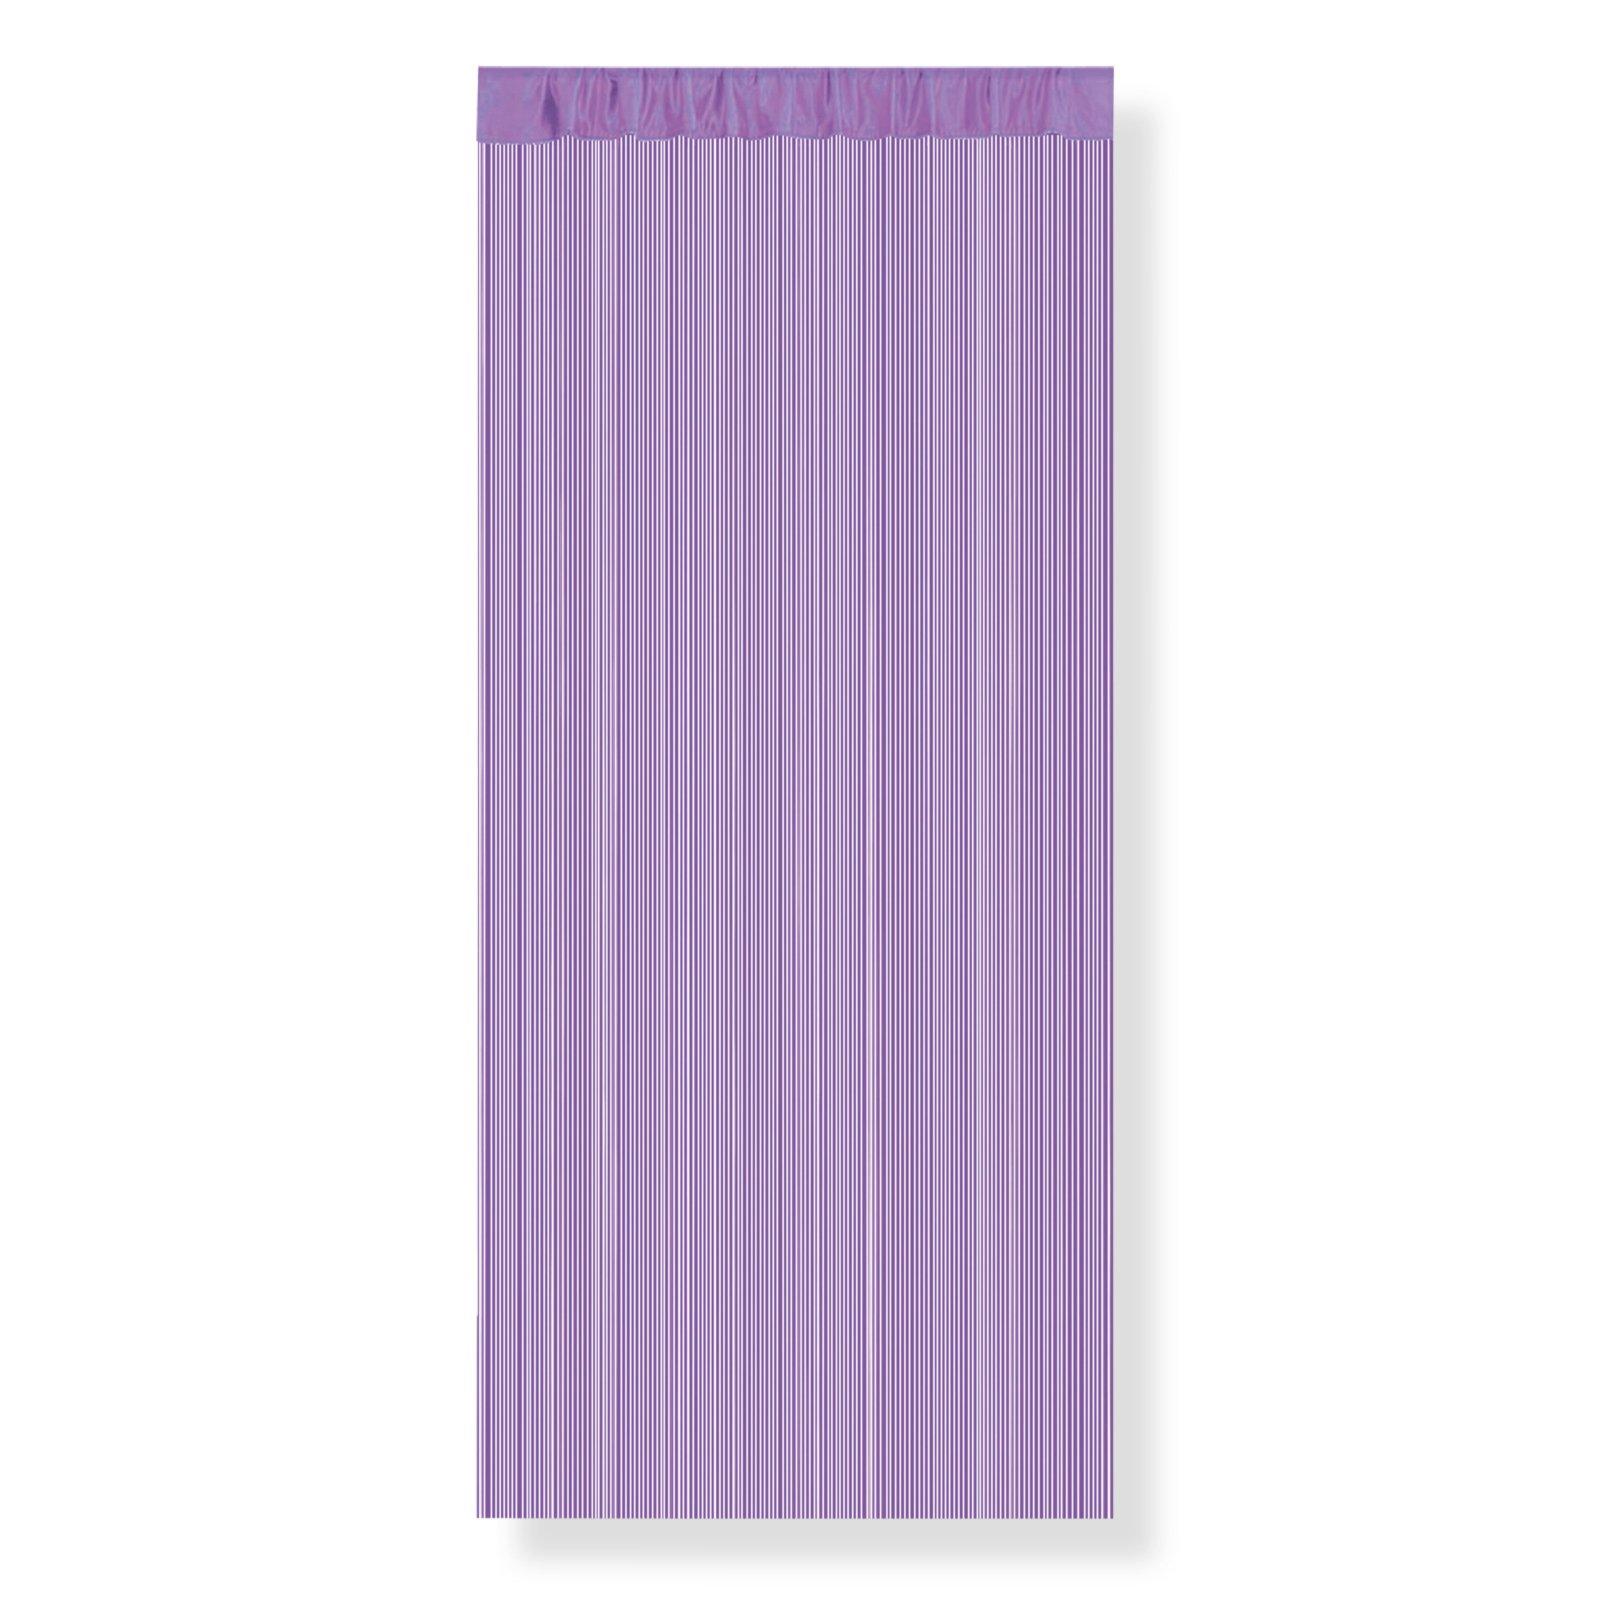 fadenstore string lila 90x245 cm fadengardinen gardinen vorh nge deko haushalt. Black Bedroom Furniture Sets. Home Design Ideas